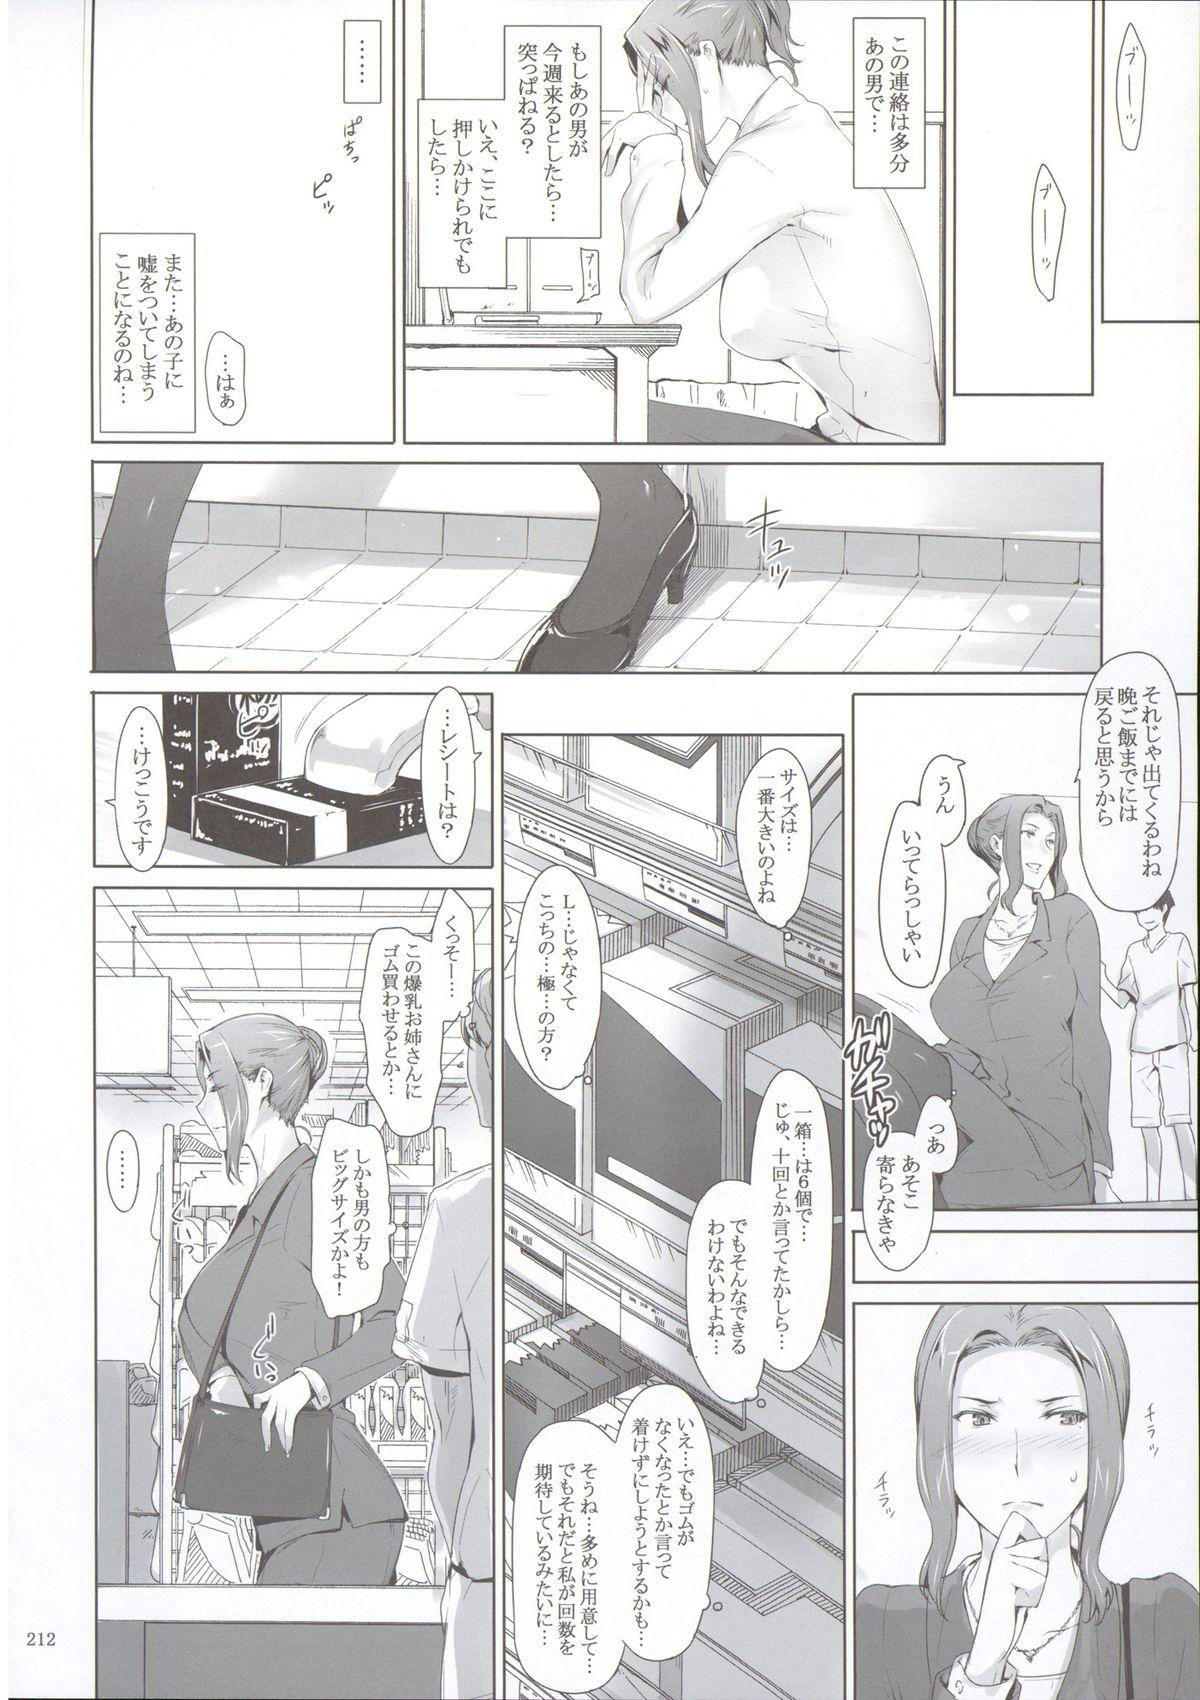 (C86) [MTSP (Jin)] Tachibana-san-chi no Dansei Jijou Matome Ban [Incomplete] 10